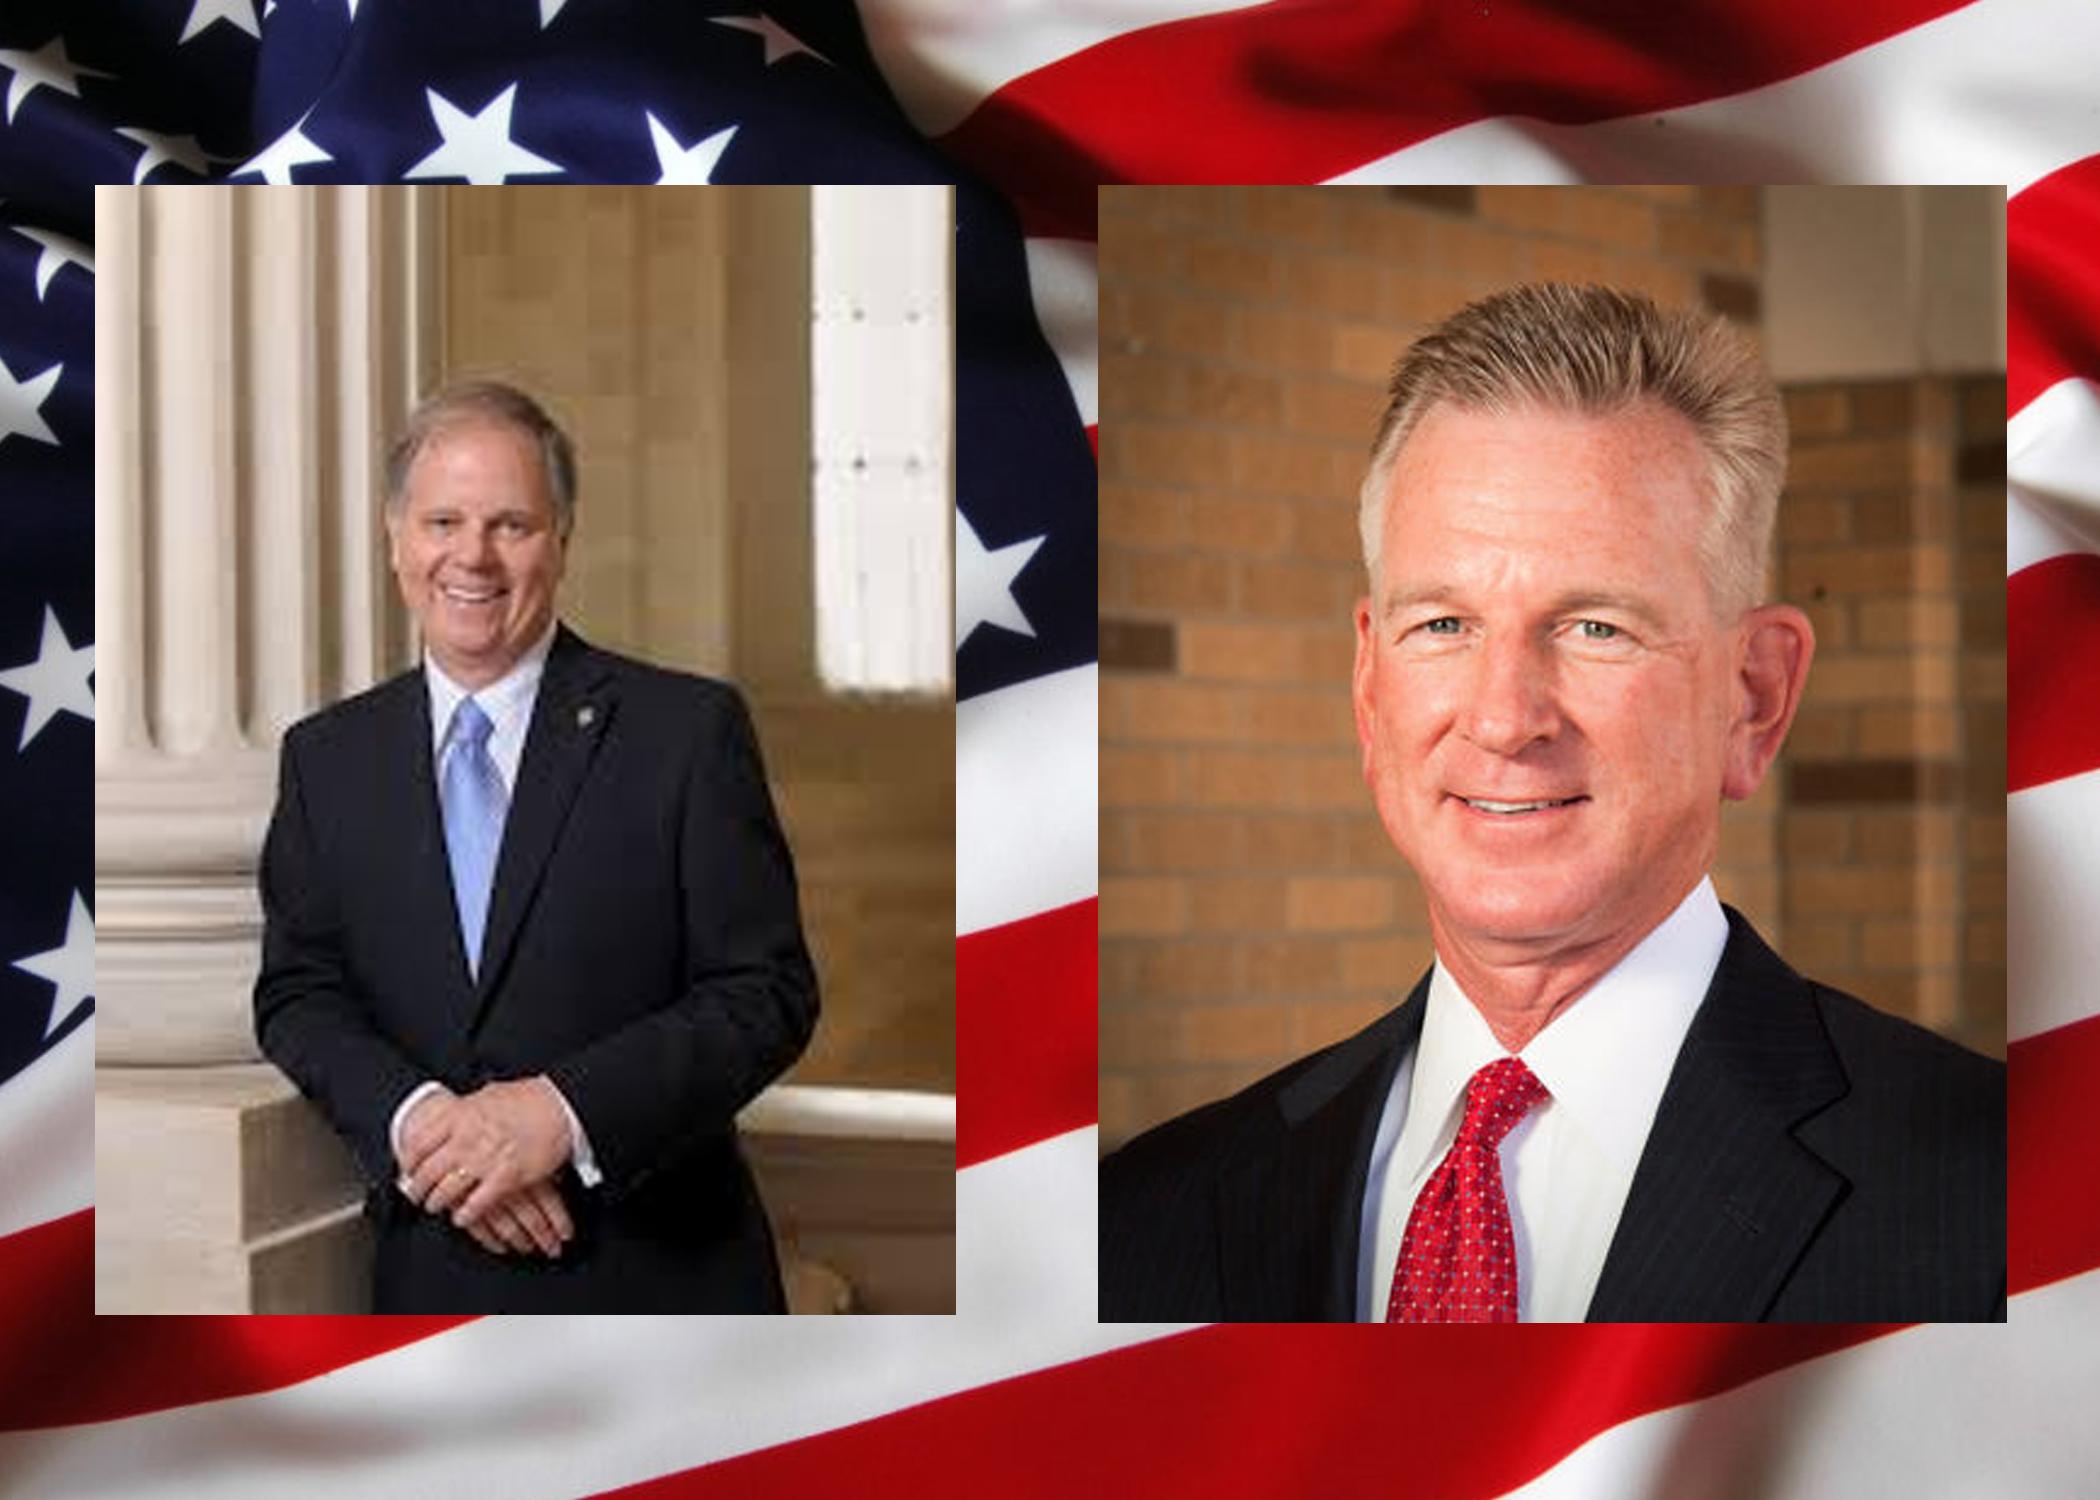 Nov. 3 General Election information for Alabama Senate and Public Service Commission